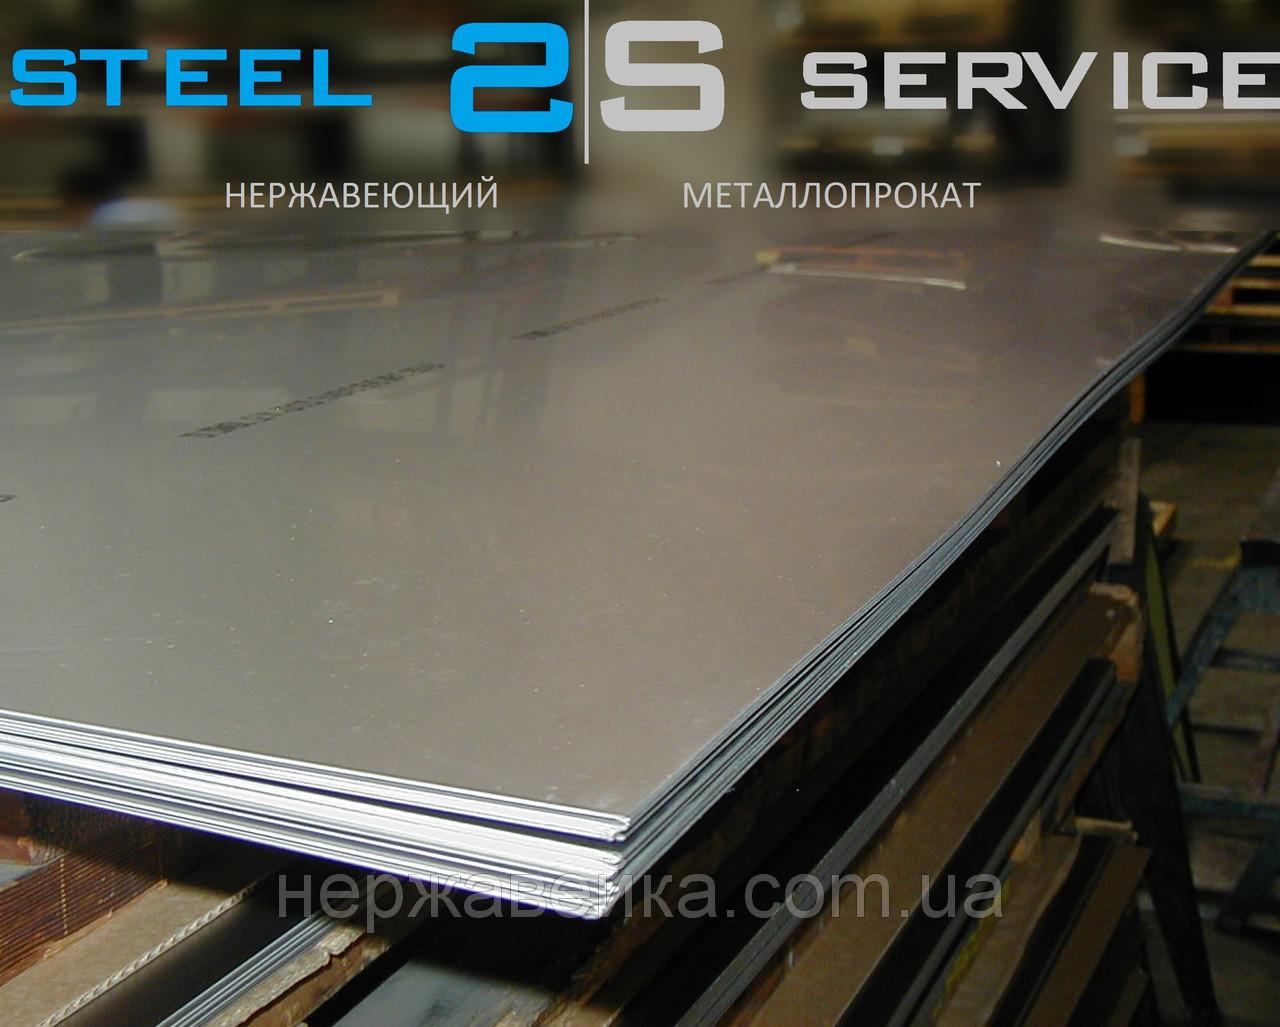 Листовая нержавейка 90х1500х6000мм  AISI 321(08Х18Н10Т) F1 - горячекатанный, пищевой